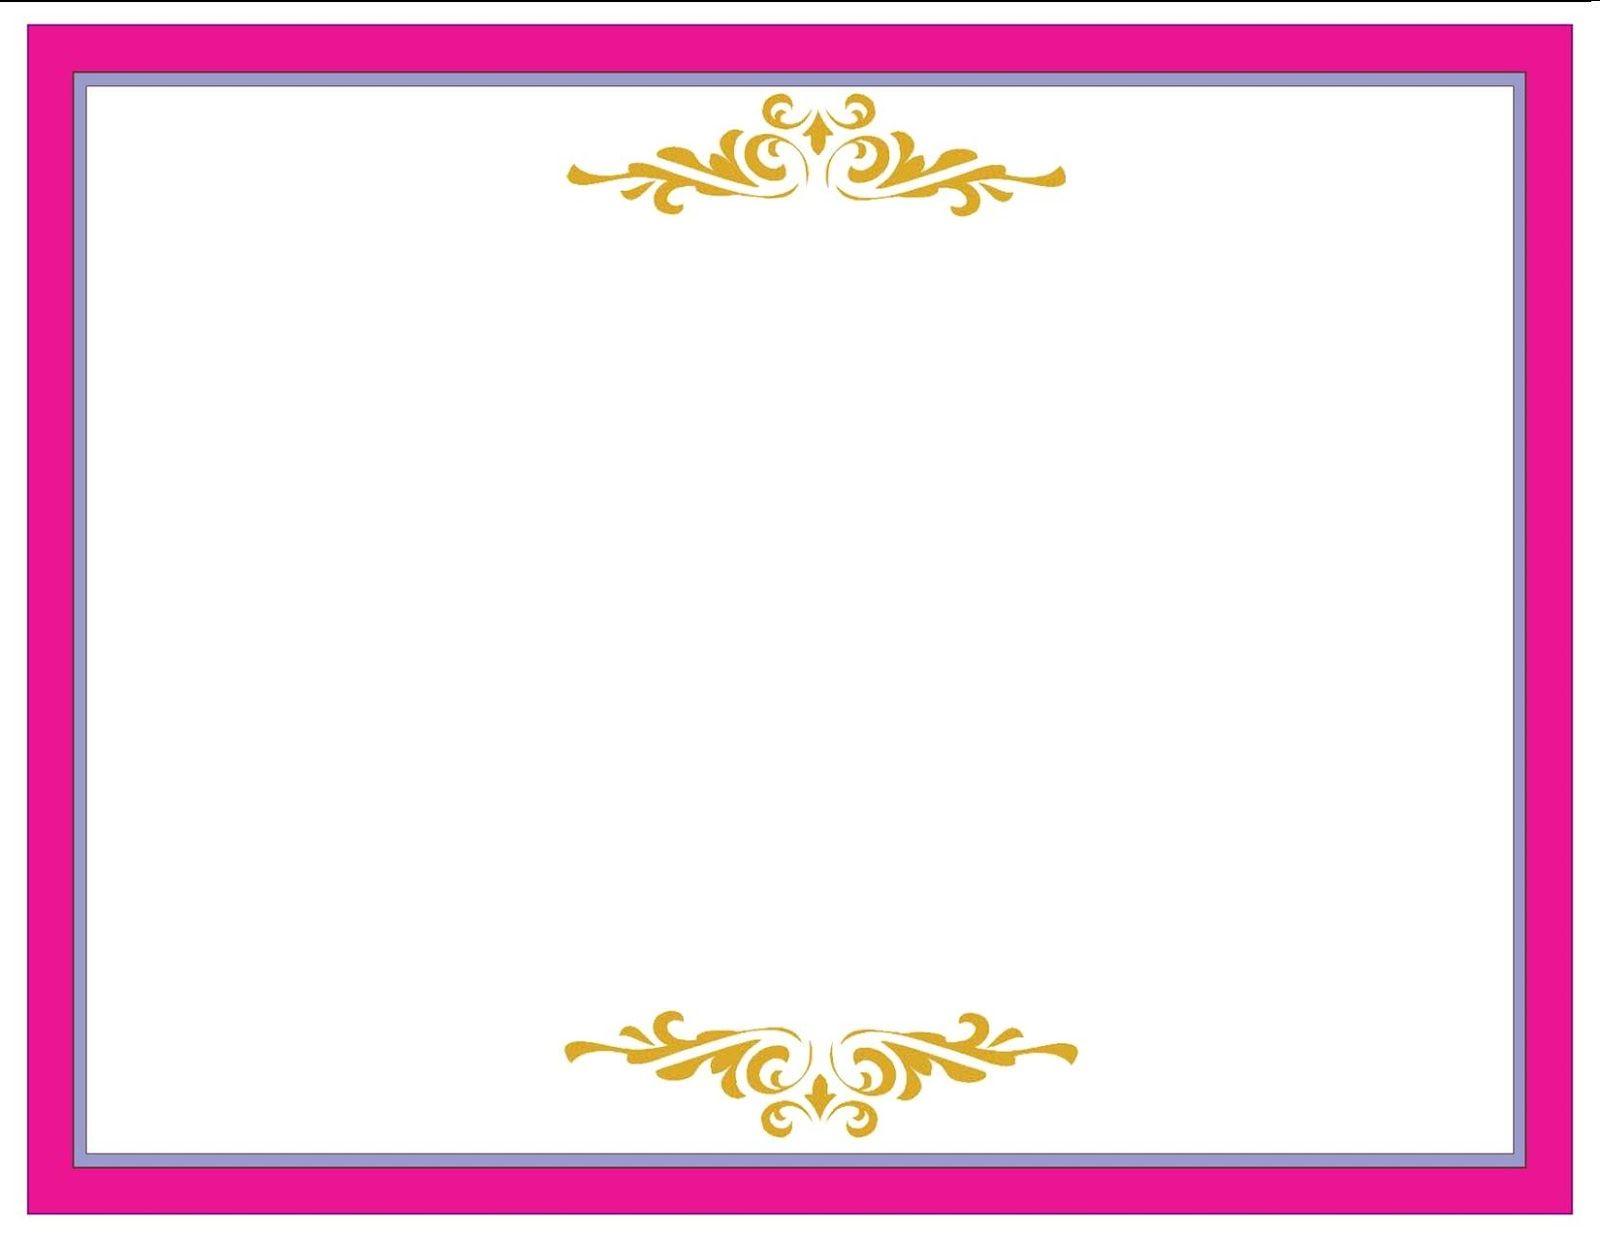 pinkframe diy wedding background for your virtual wedding album by